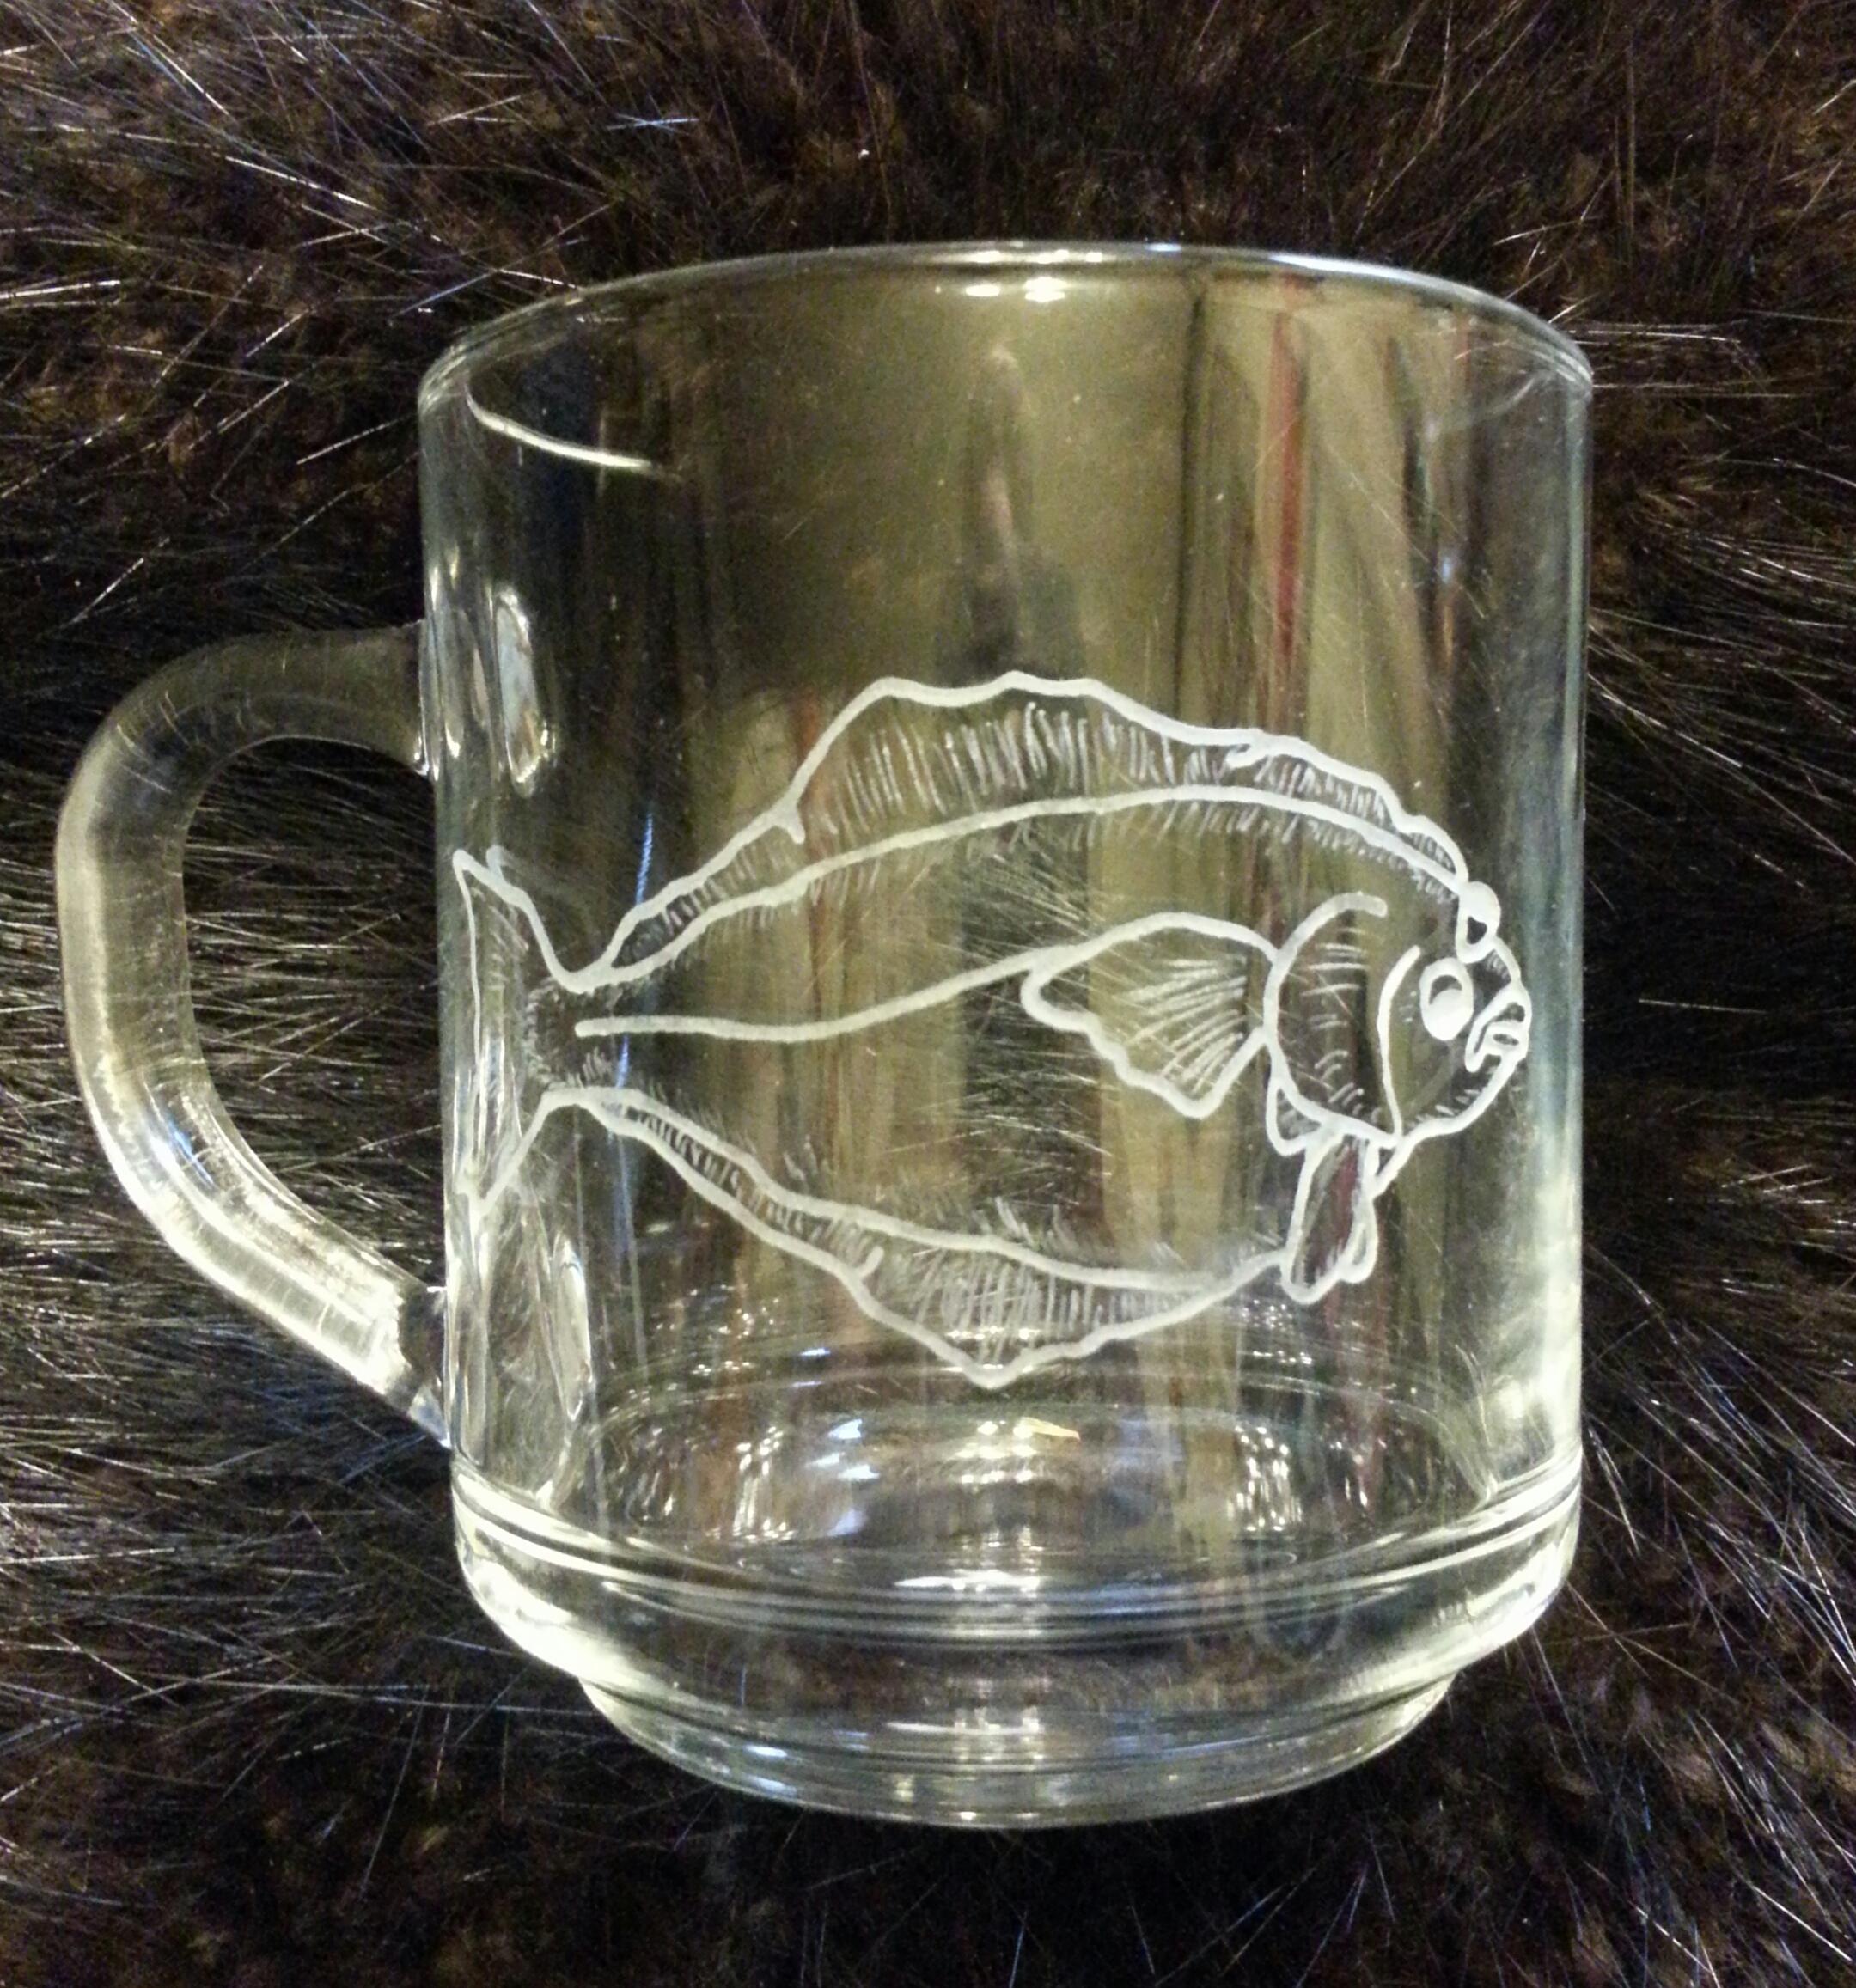 Halibut engraved coffee mug...  $30.00 ea